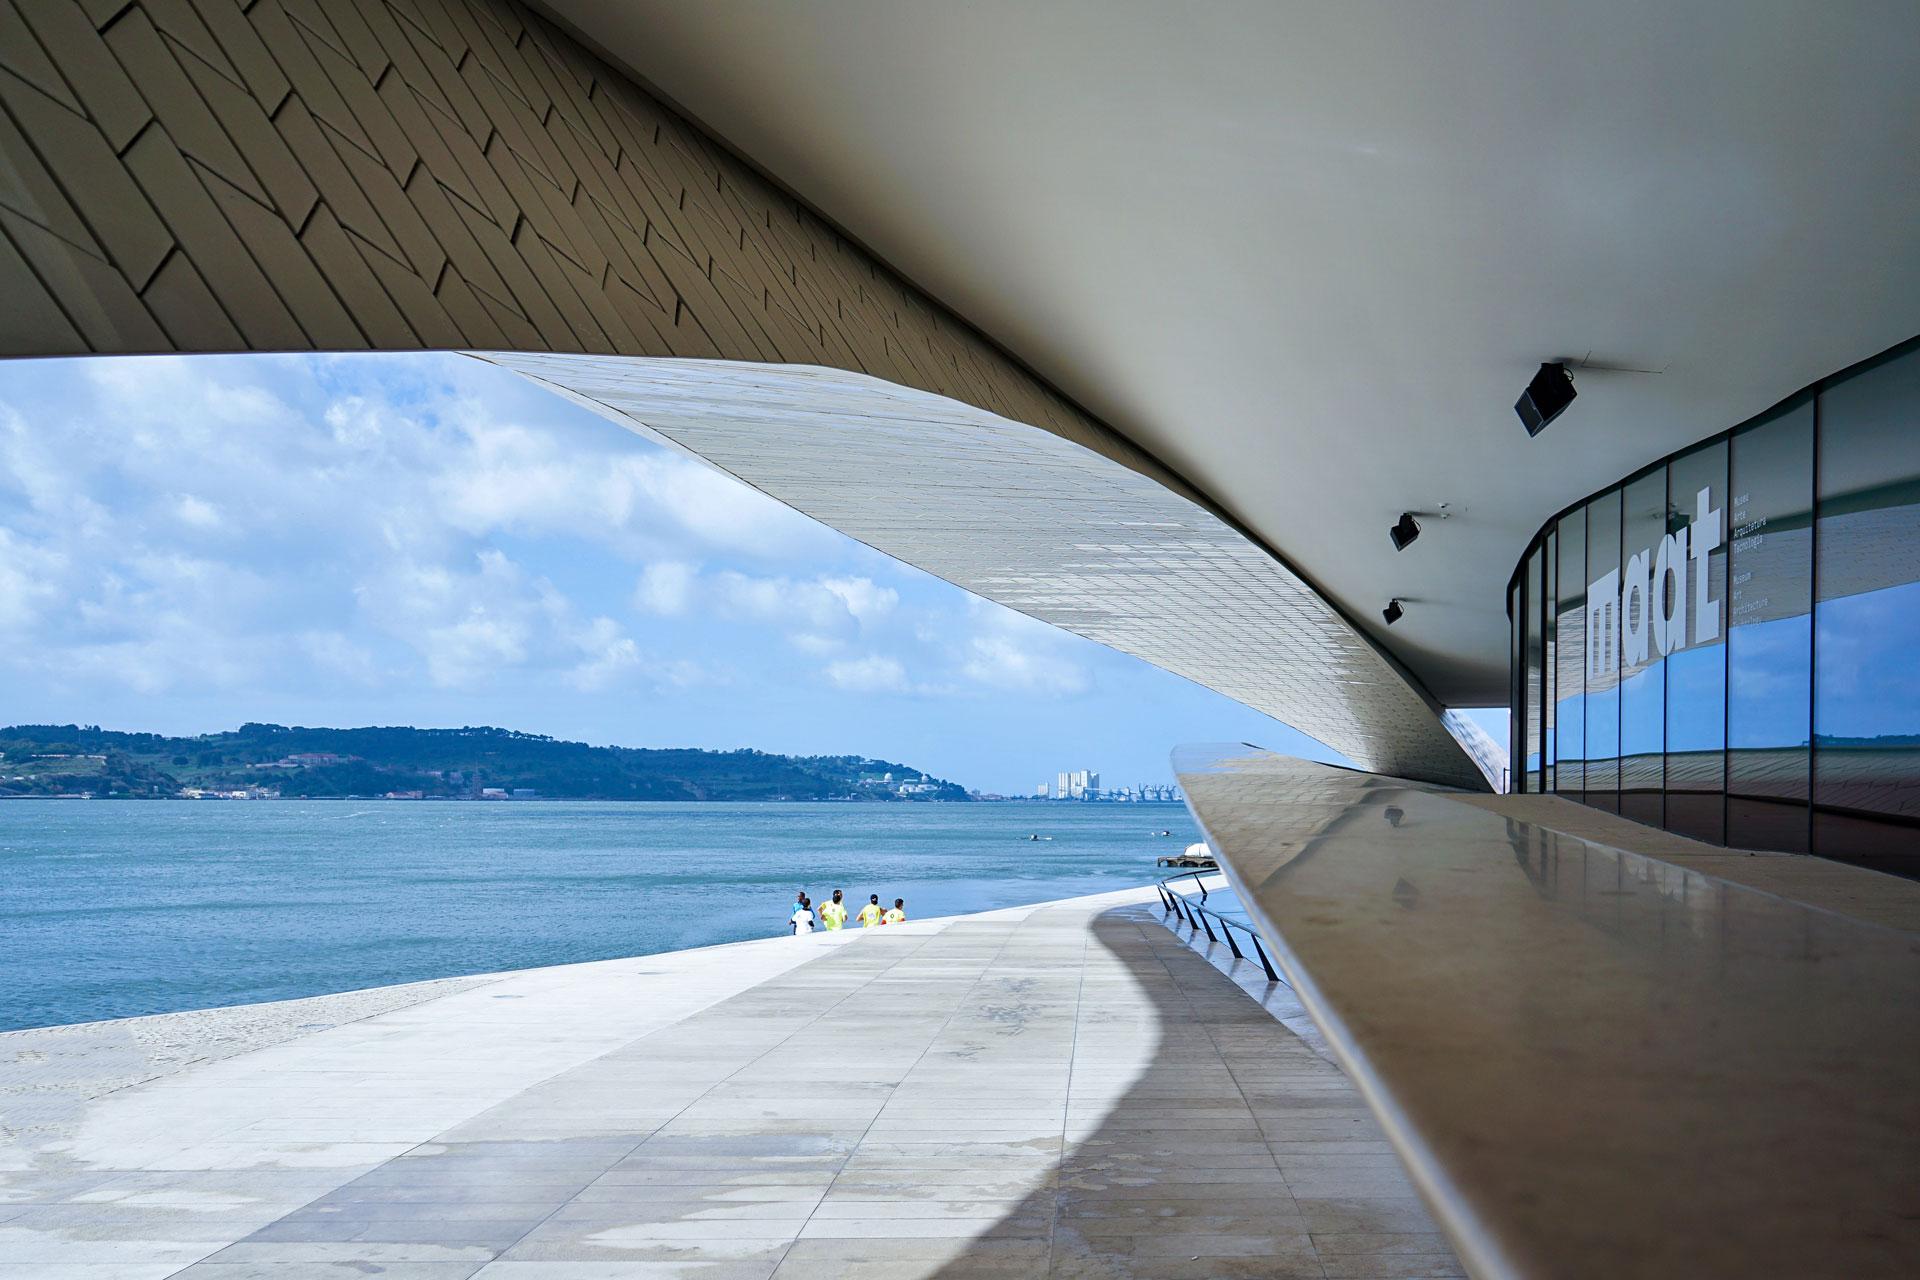 maat, architettura contemporanea, amanda levete, rio tejo, belem, lisboa, portogallo, elena galimberti, fotografia